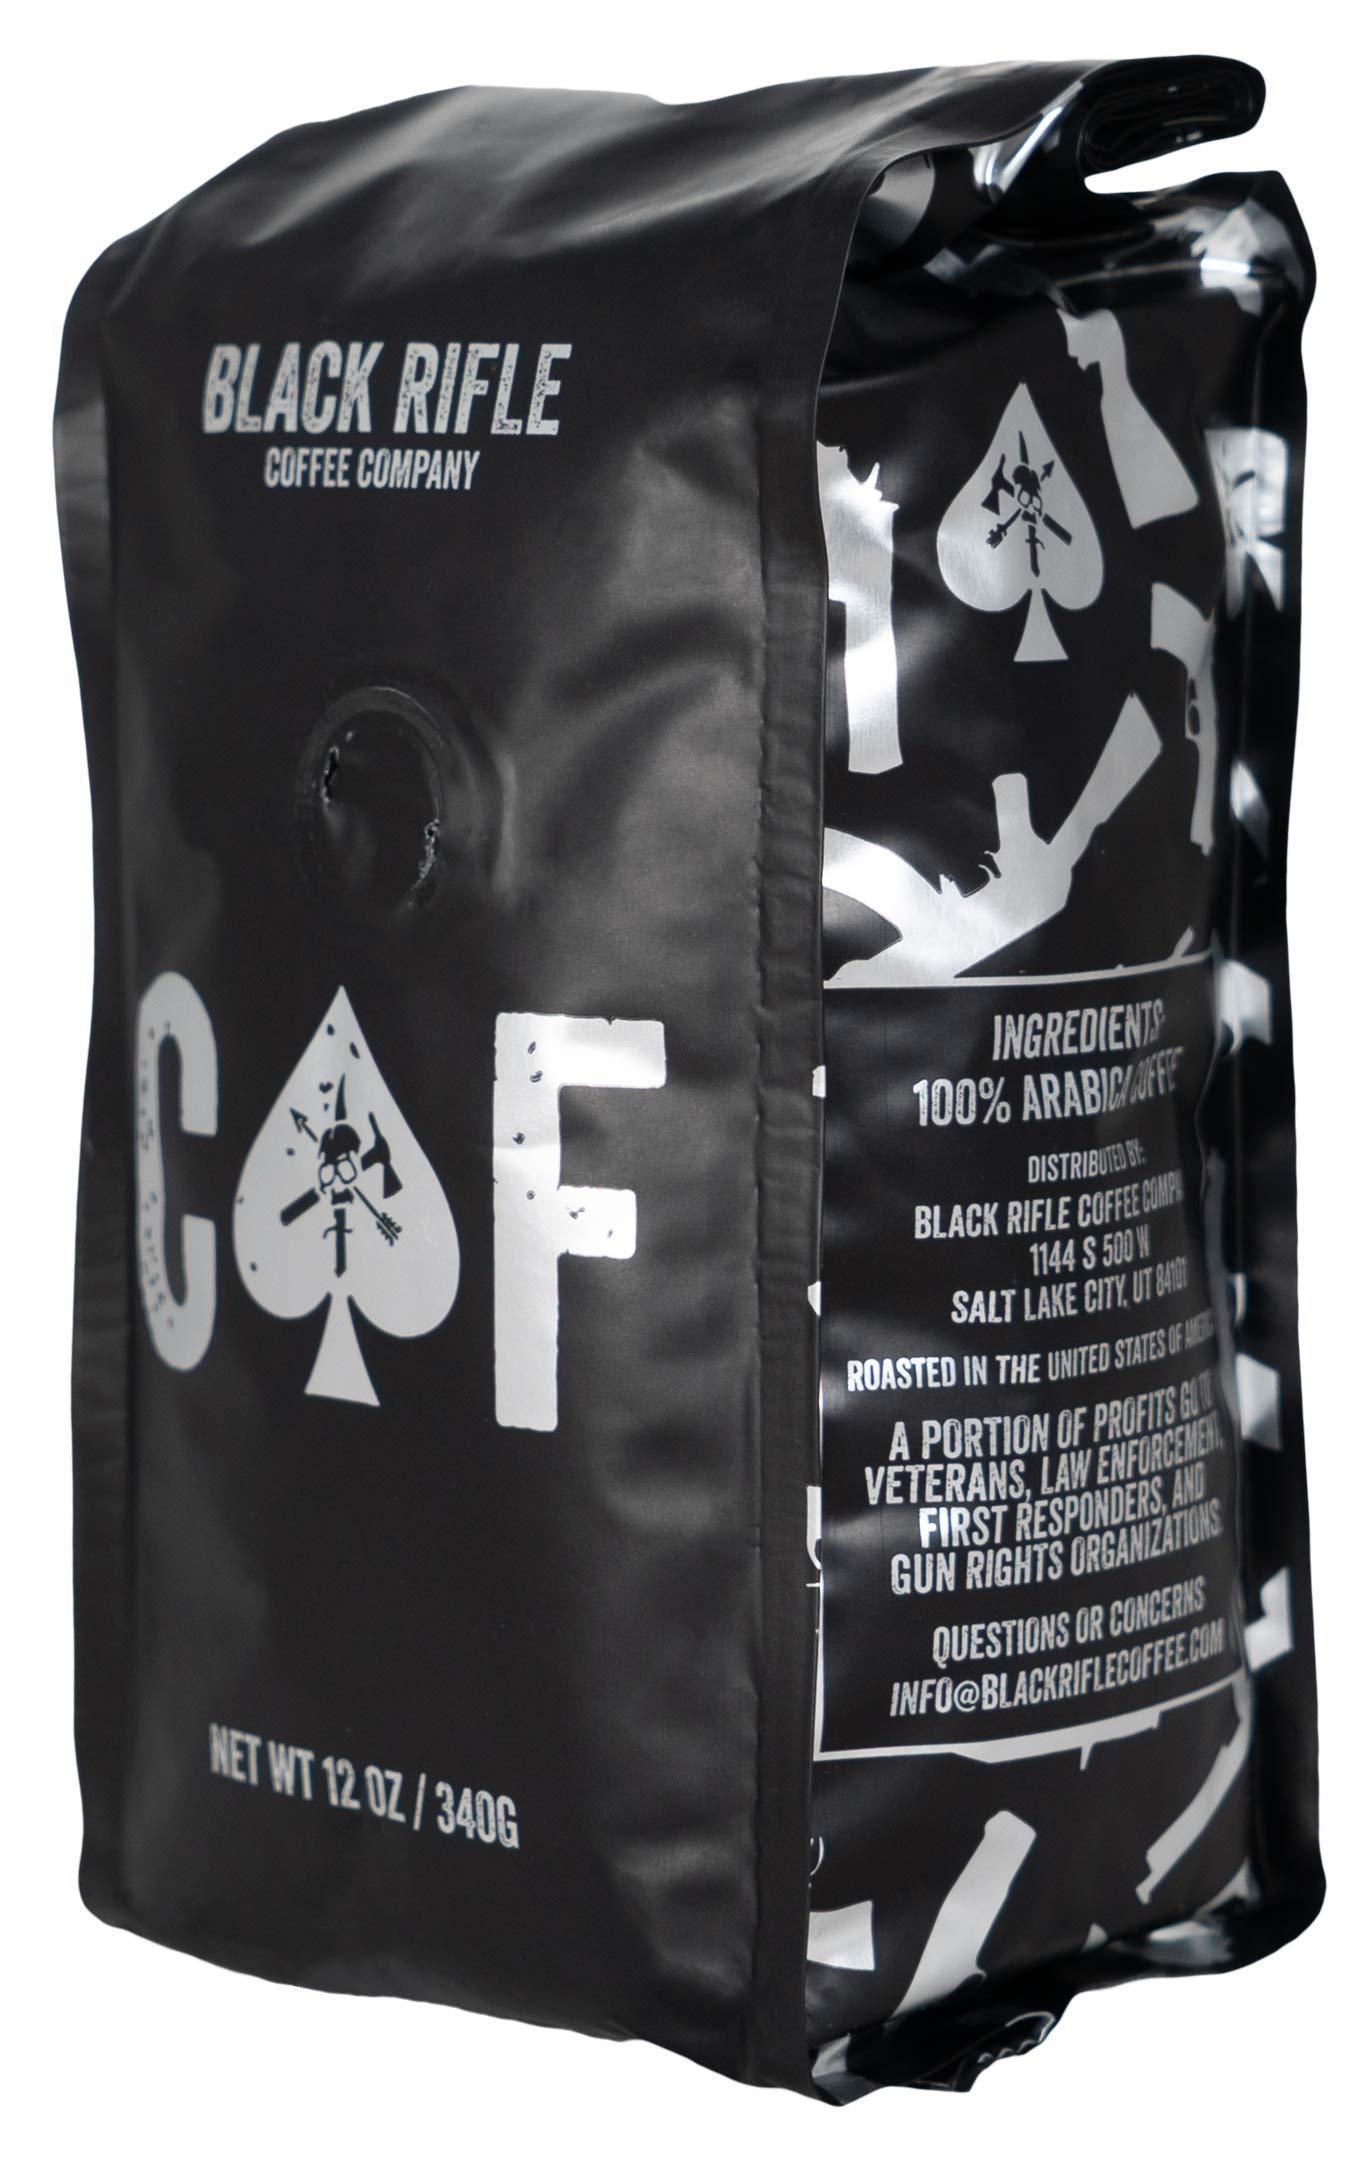 Black Rifle Coffee Company CAF Caffeinated AF Medium Roast Ground Coffee, 12 Ounce Bag by Black Rifle Coffee Company